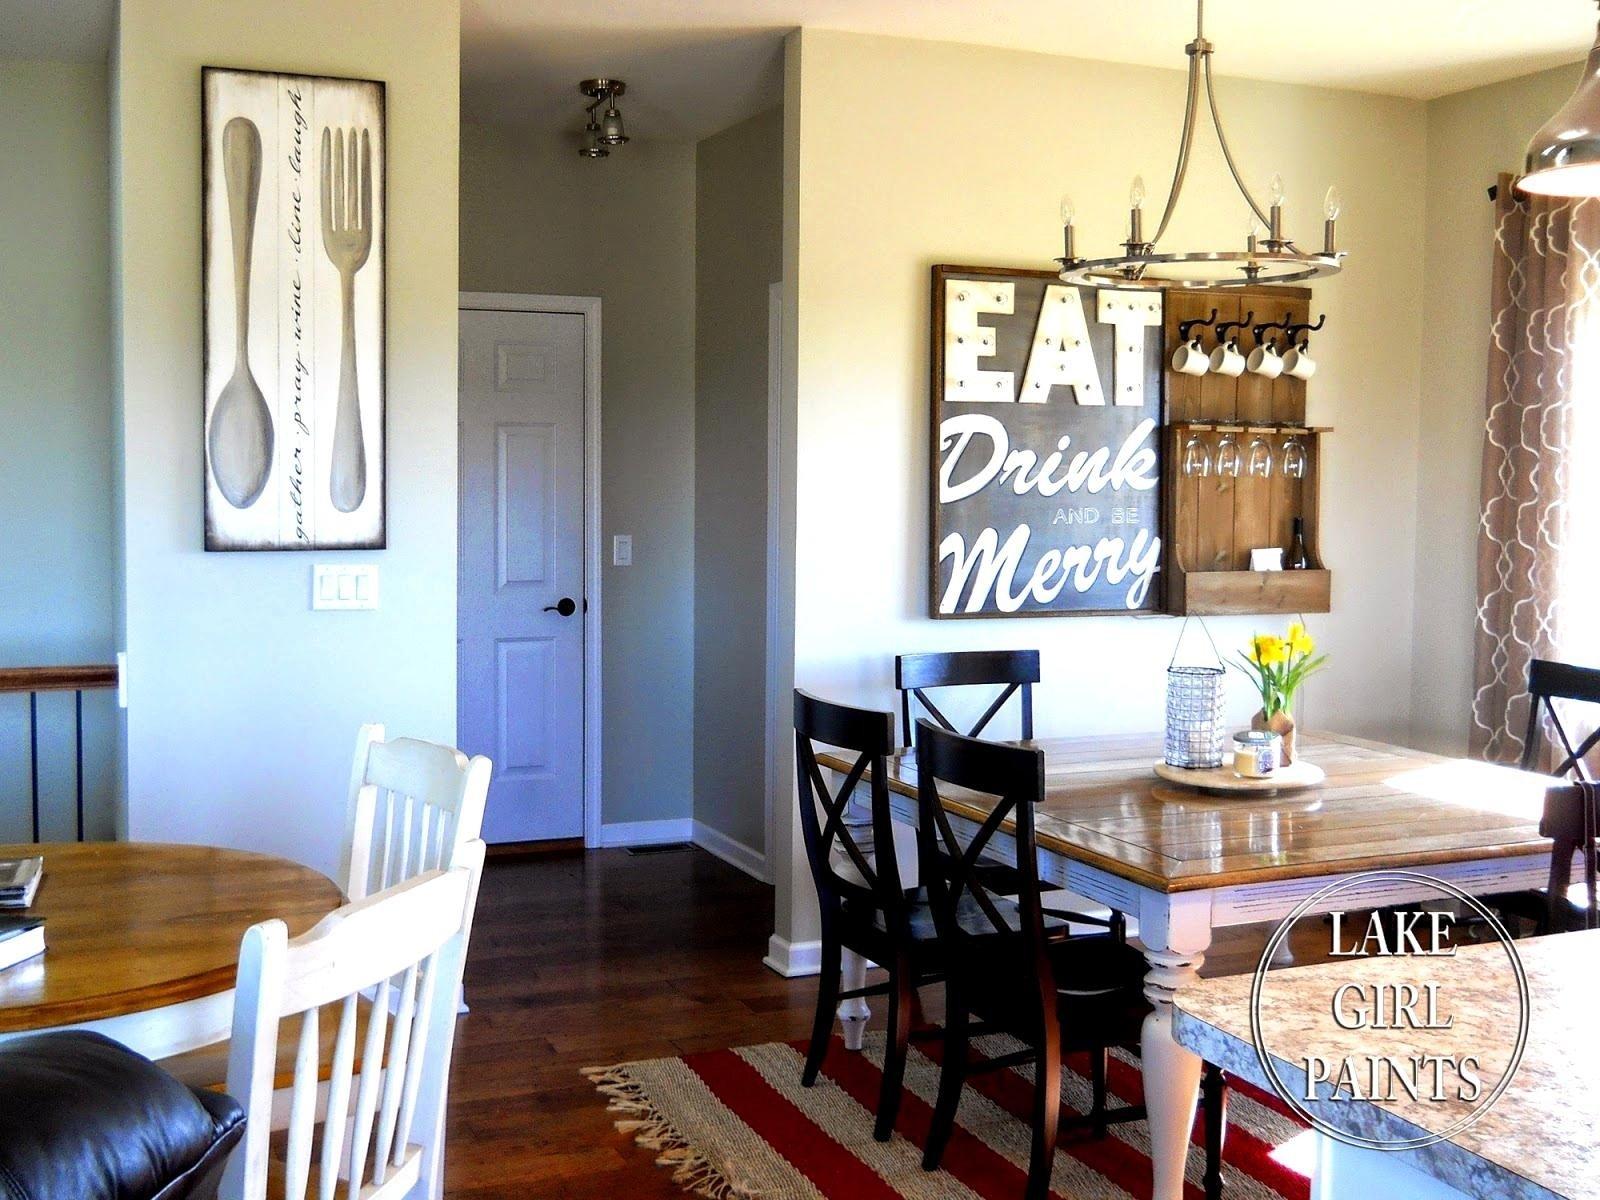 10 Unique Wall Decor Ideas For Dining Room interior dining room wall art ideas powder living modern decor 2020